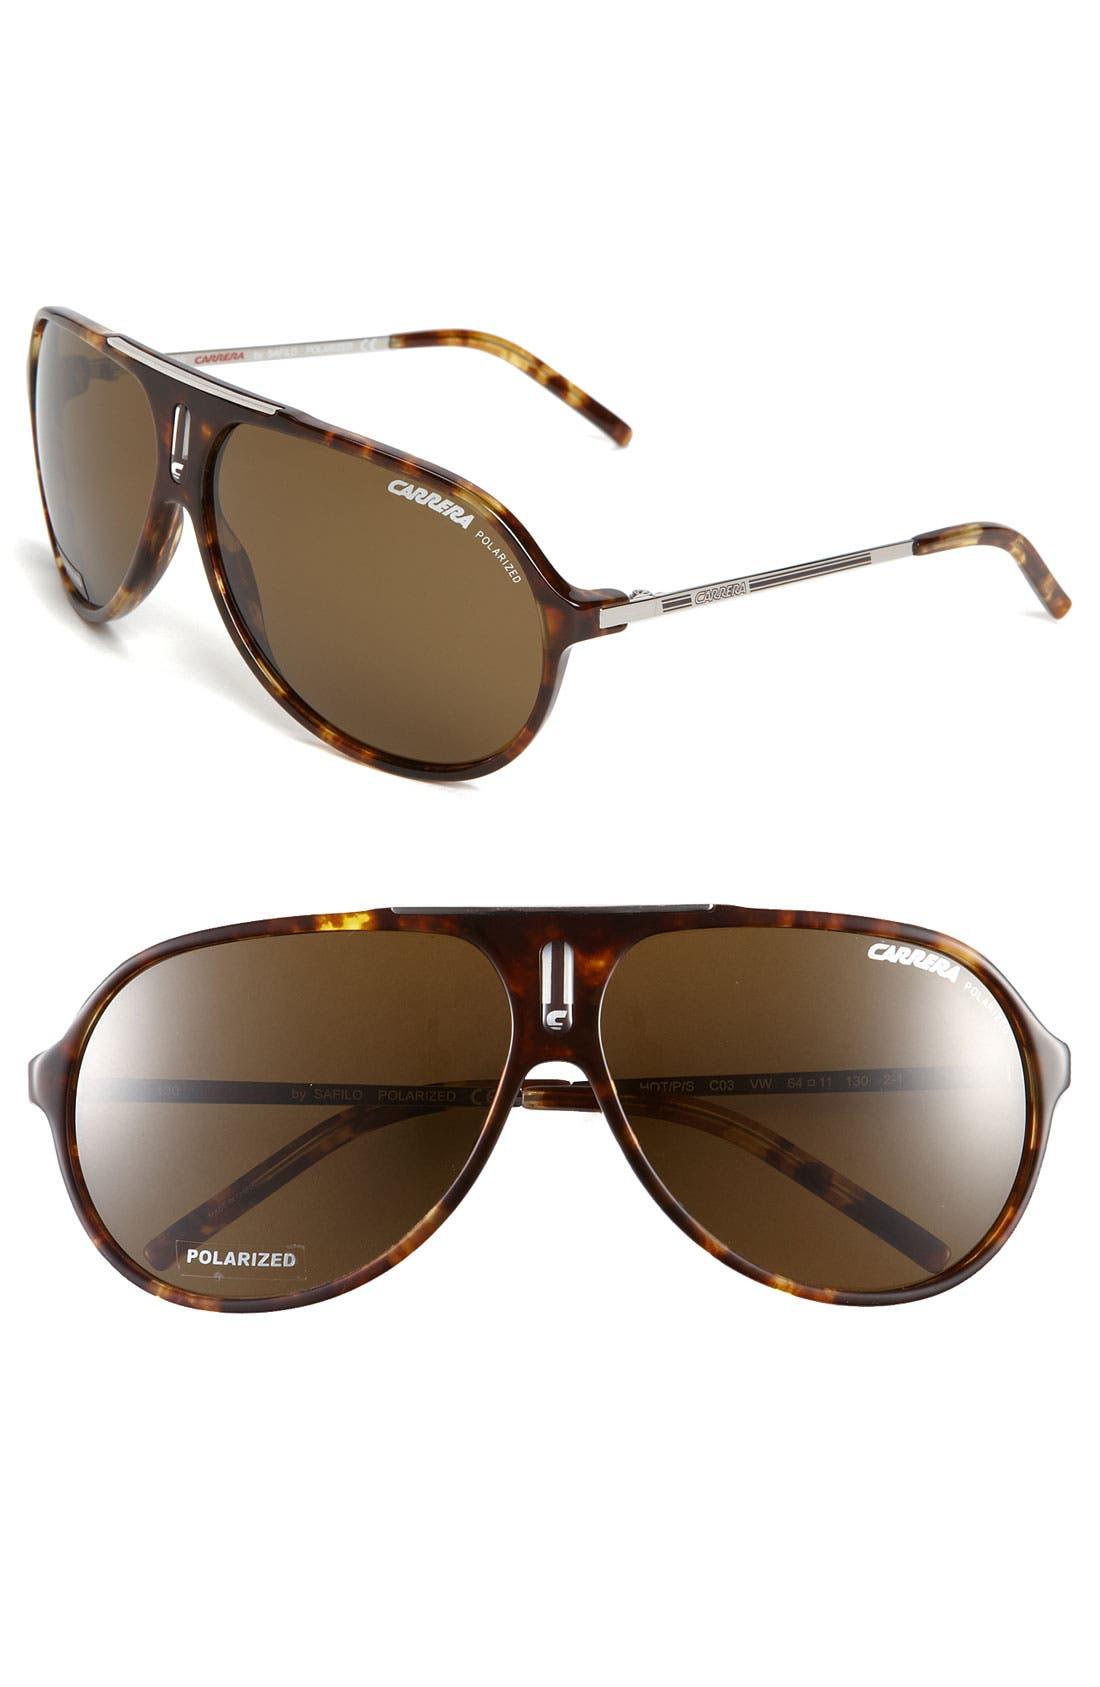 Main Image - Carrera Eyewear 'Hot' 64mm Polarized Aviator Sunglasses